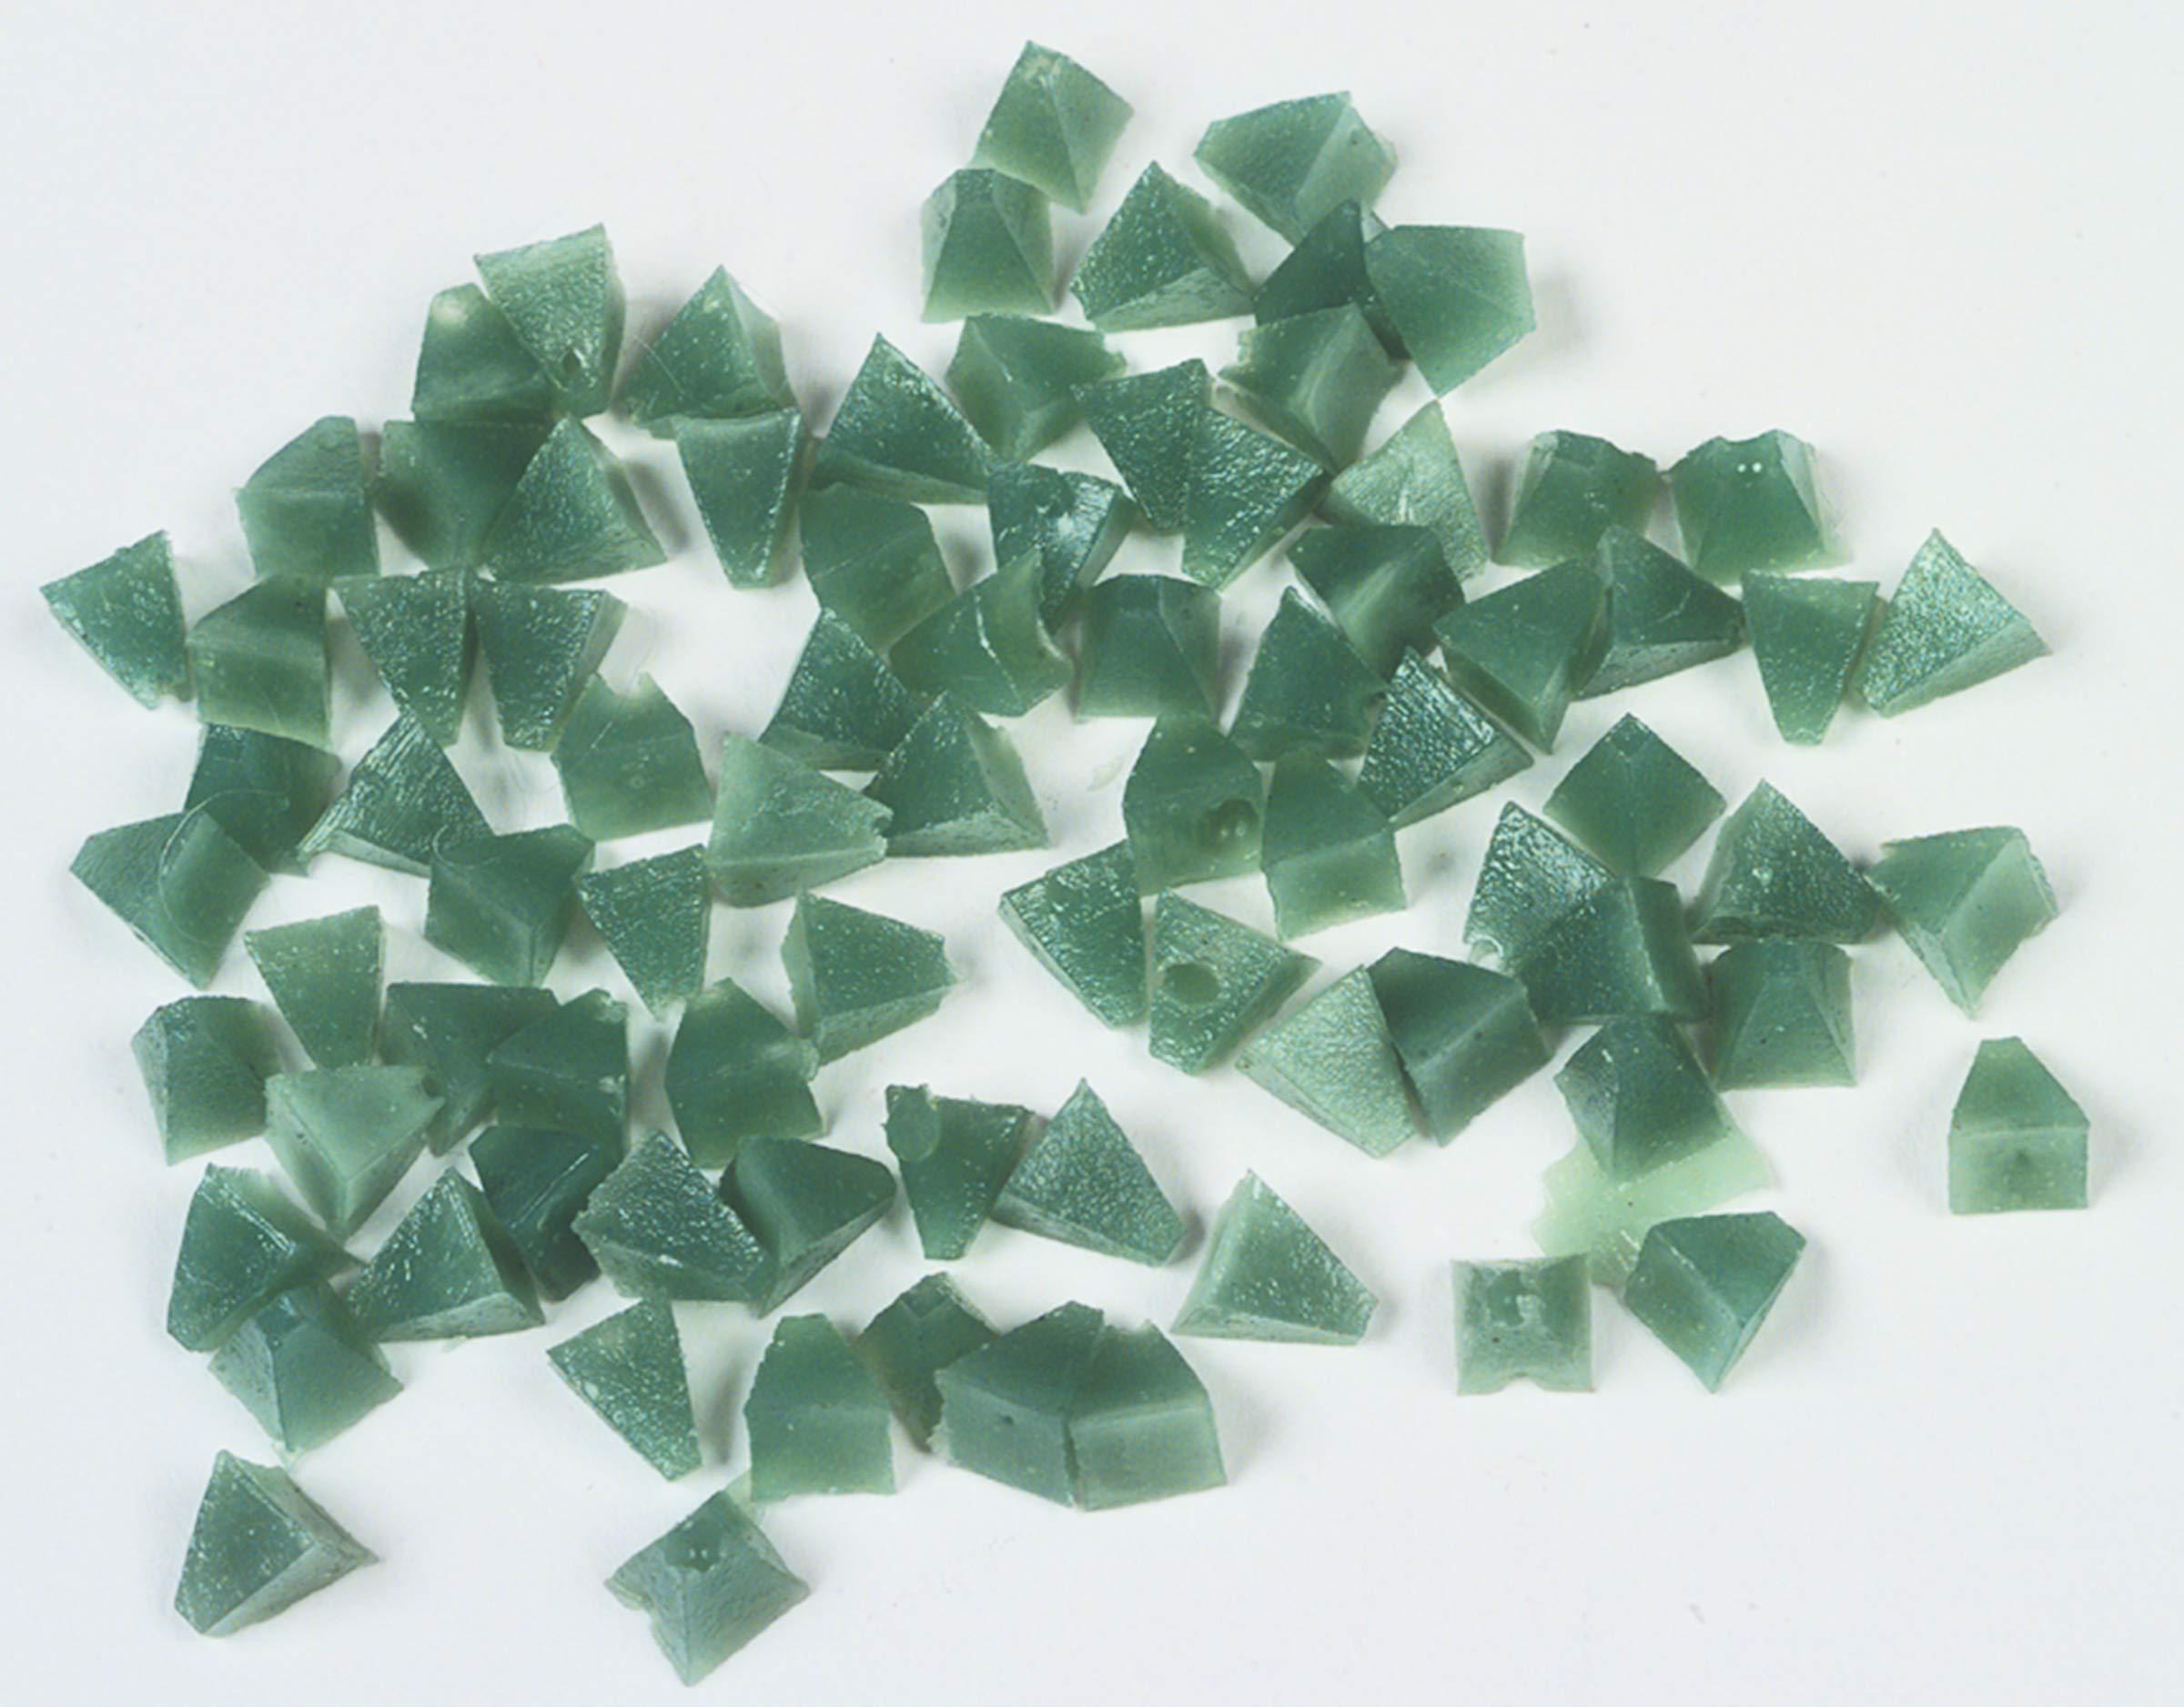 Raytech 41-119 Very Fine Cut Pyramids Plastic Media, 55 lbs/cu ft Density, 1/4'' Size, Green, 5lbs Weight